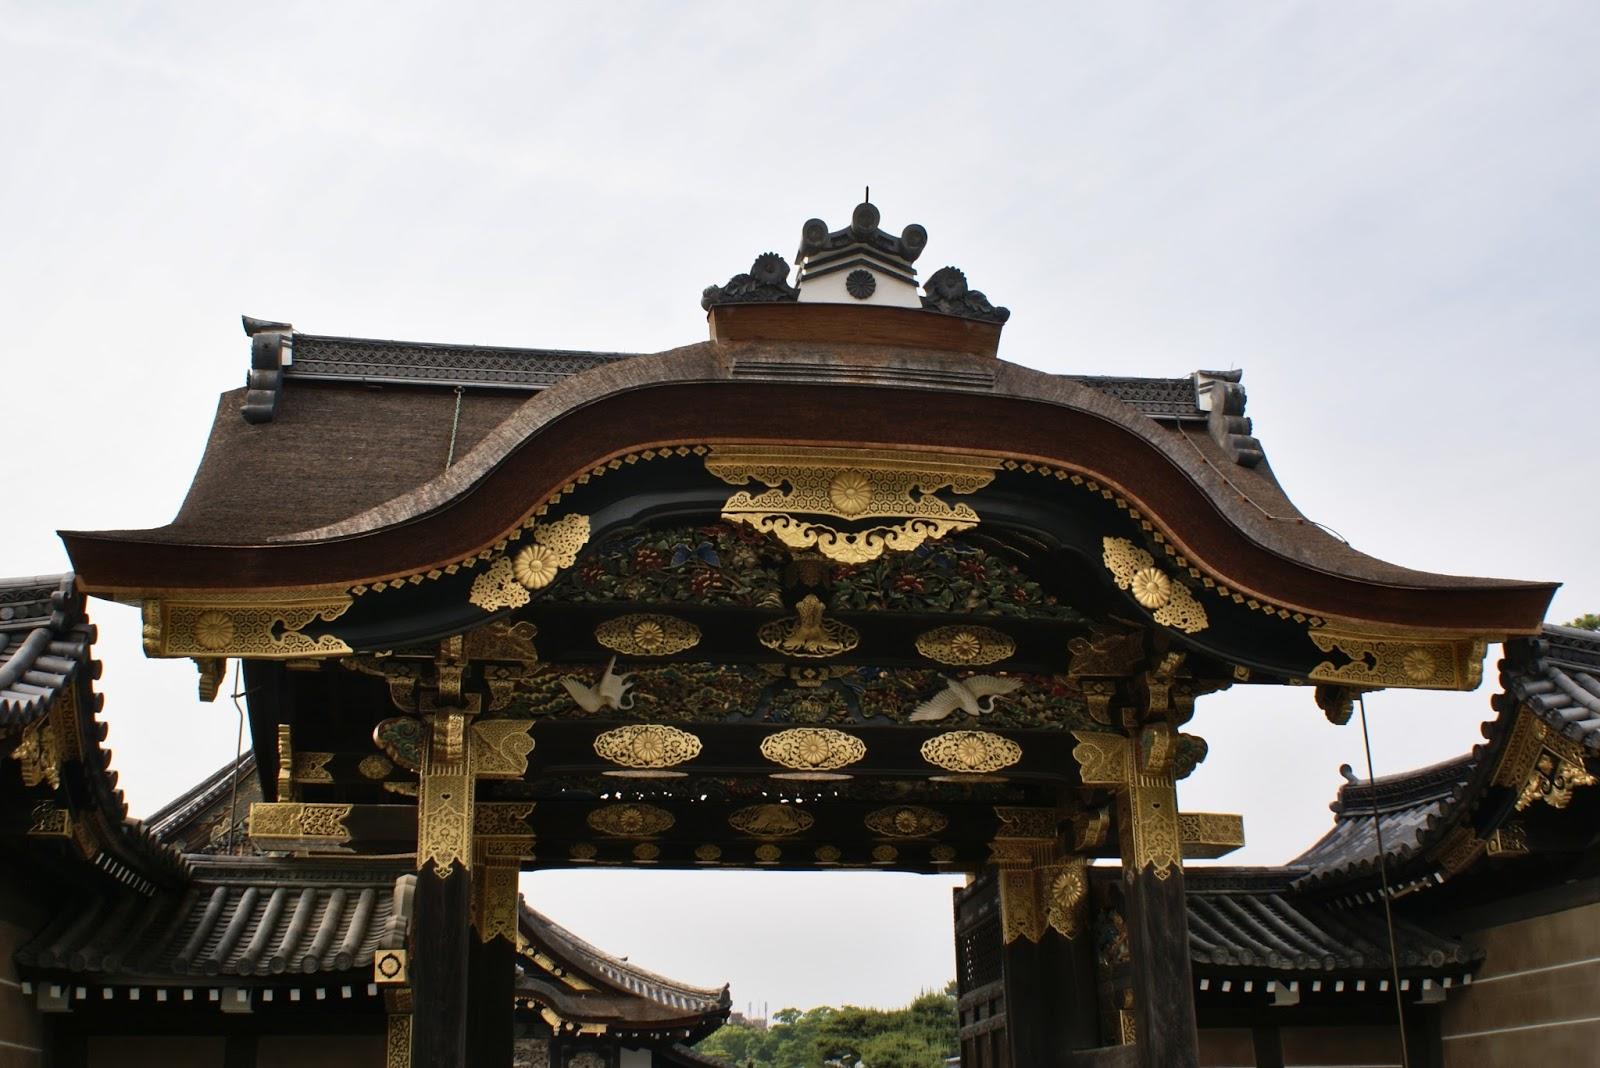 kara-mon gate nijo-jo castle kyoto japan asia